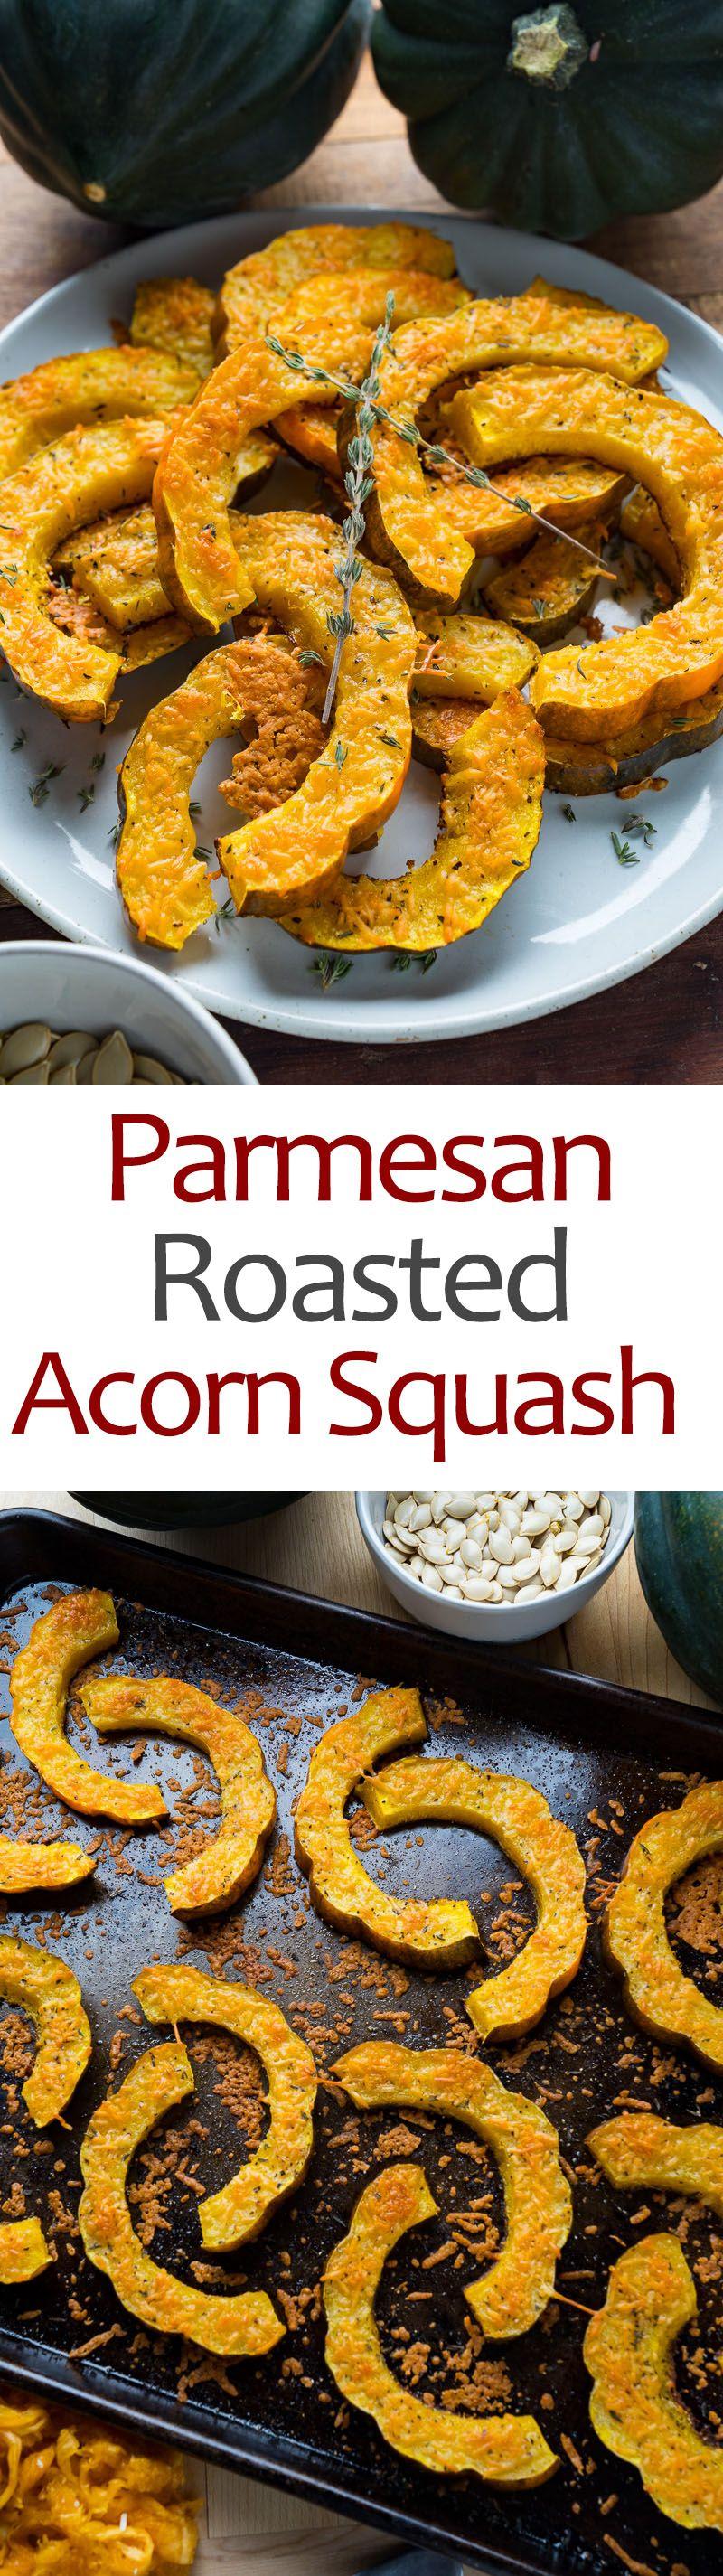 Parmesan Roasted Acorn Squash Recipe Acorn Squash Food